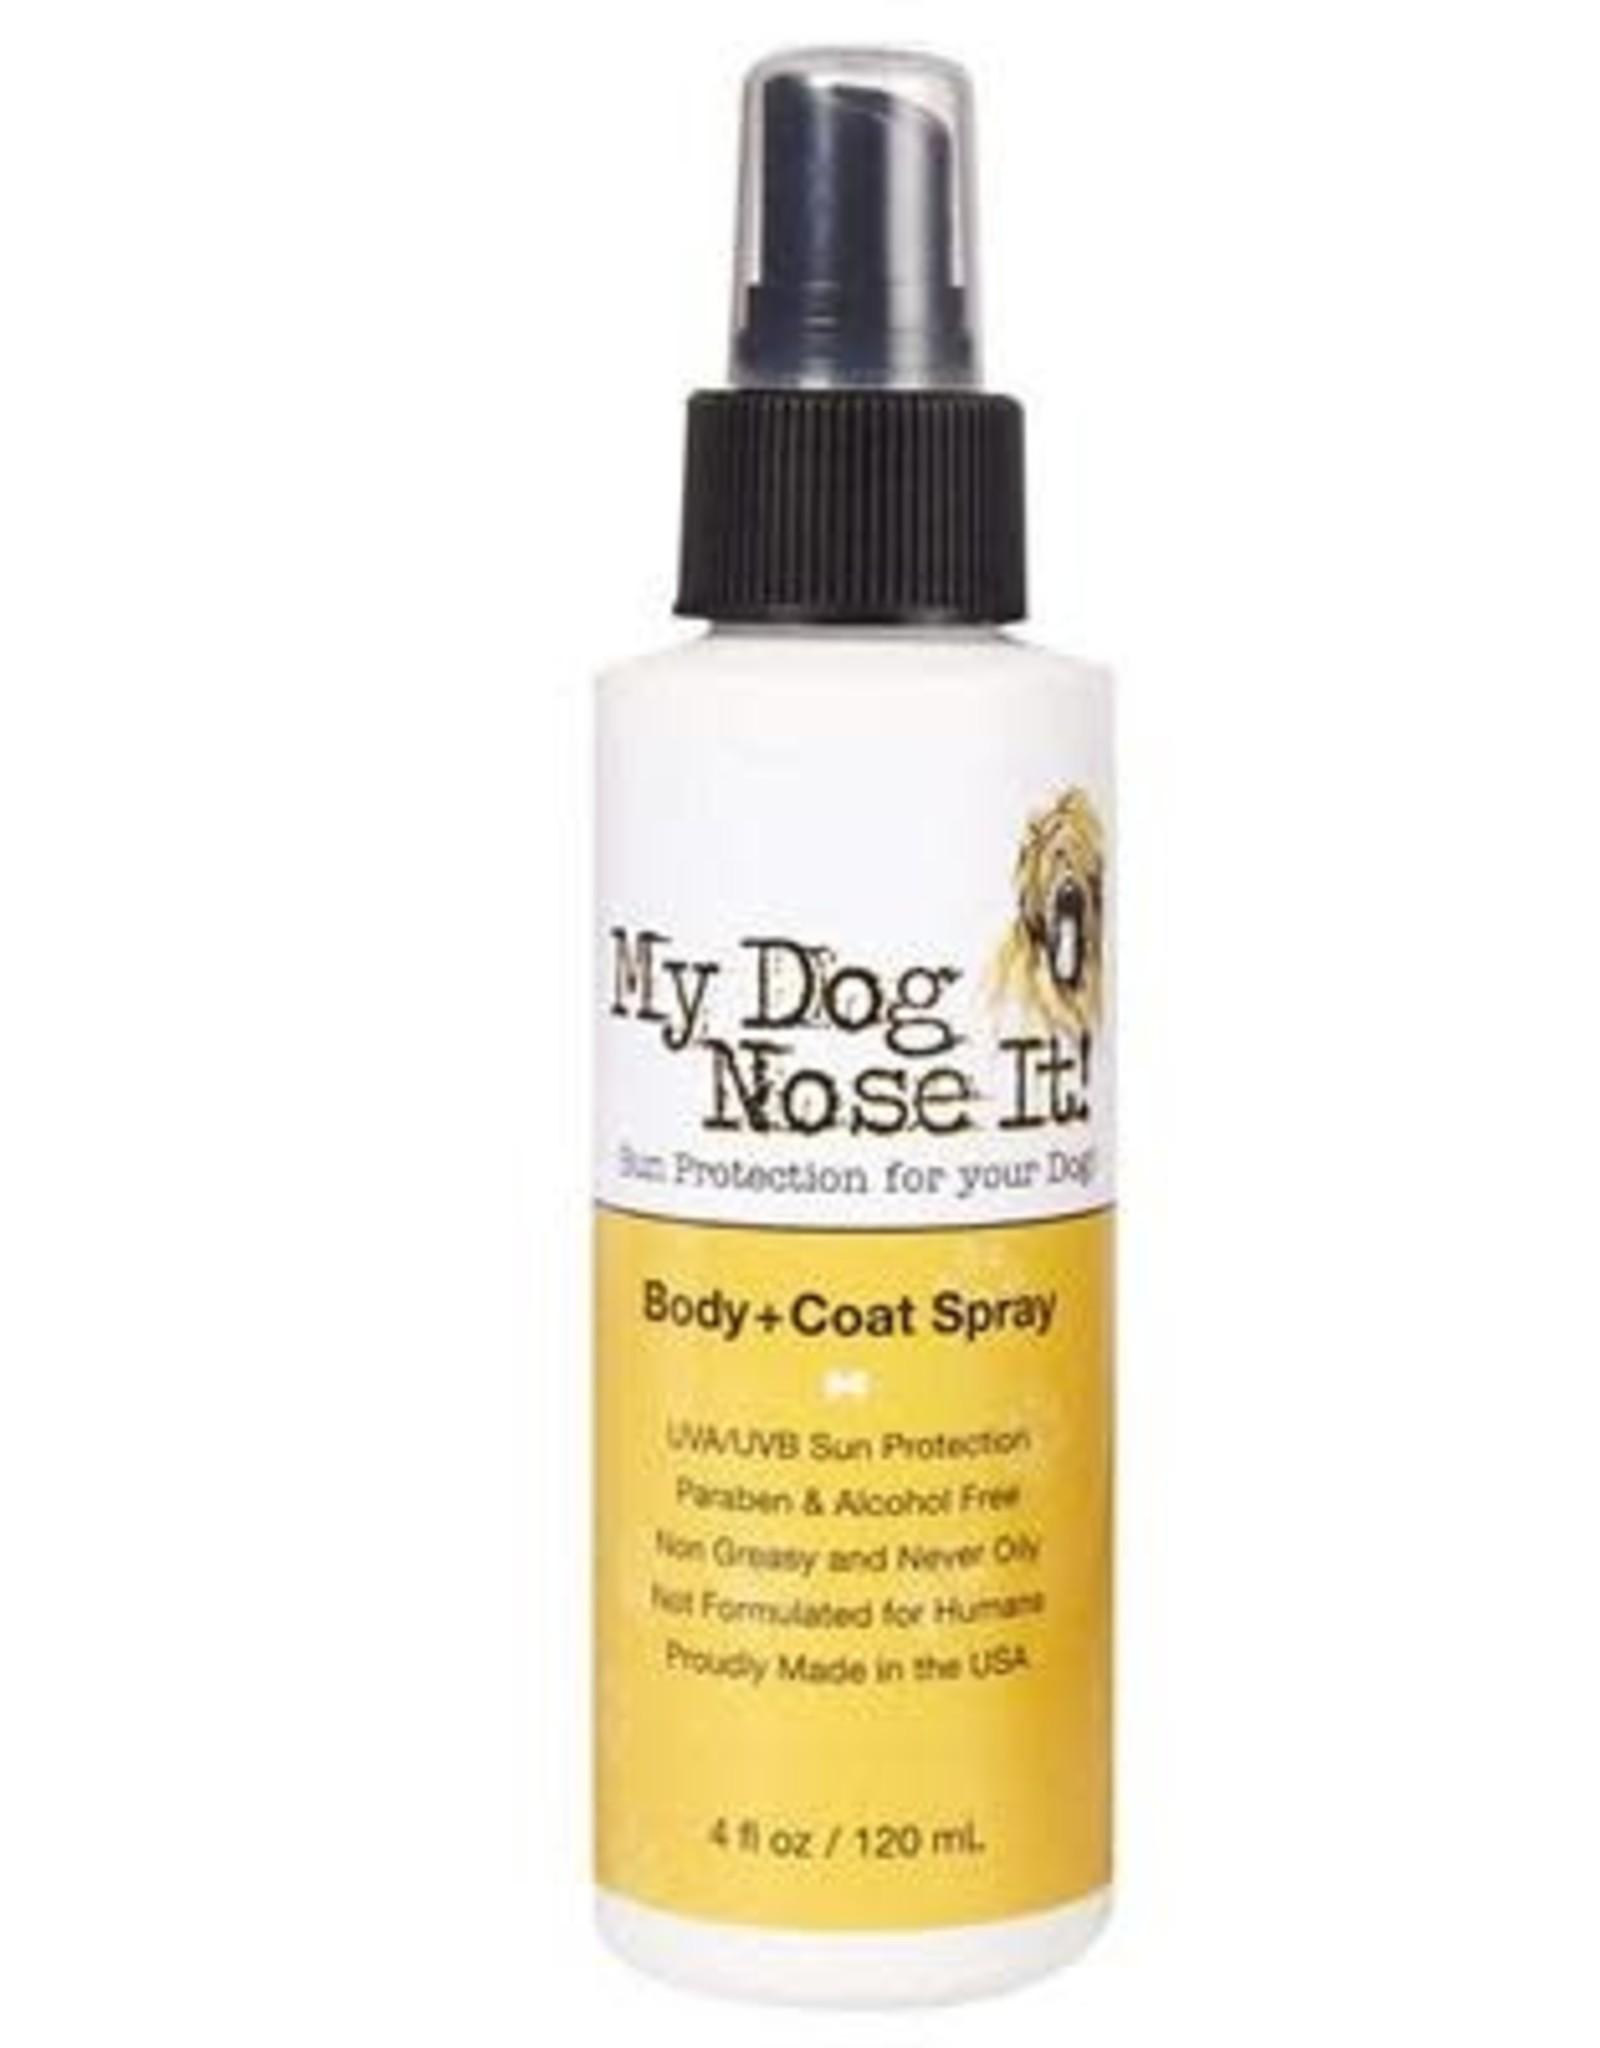 My Dog Nose It Coat and Body Spray 4oz